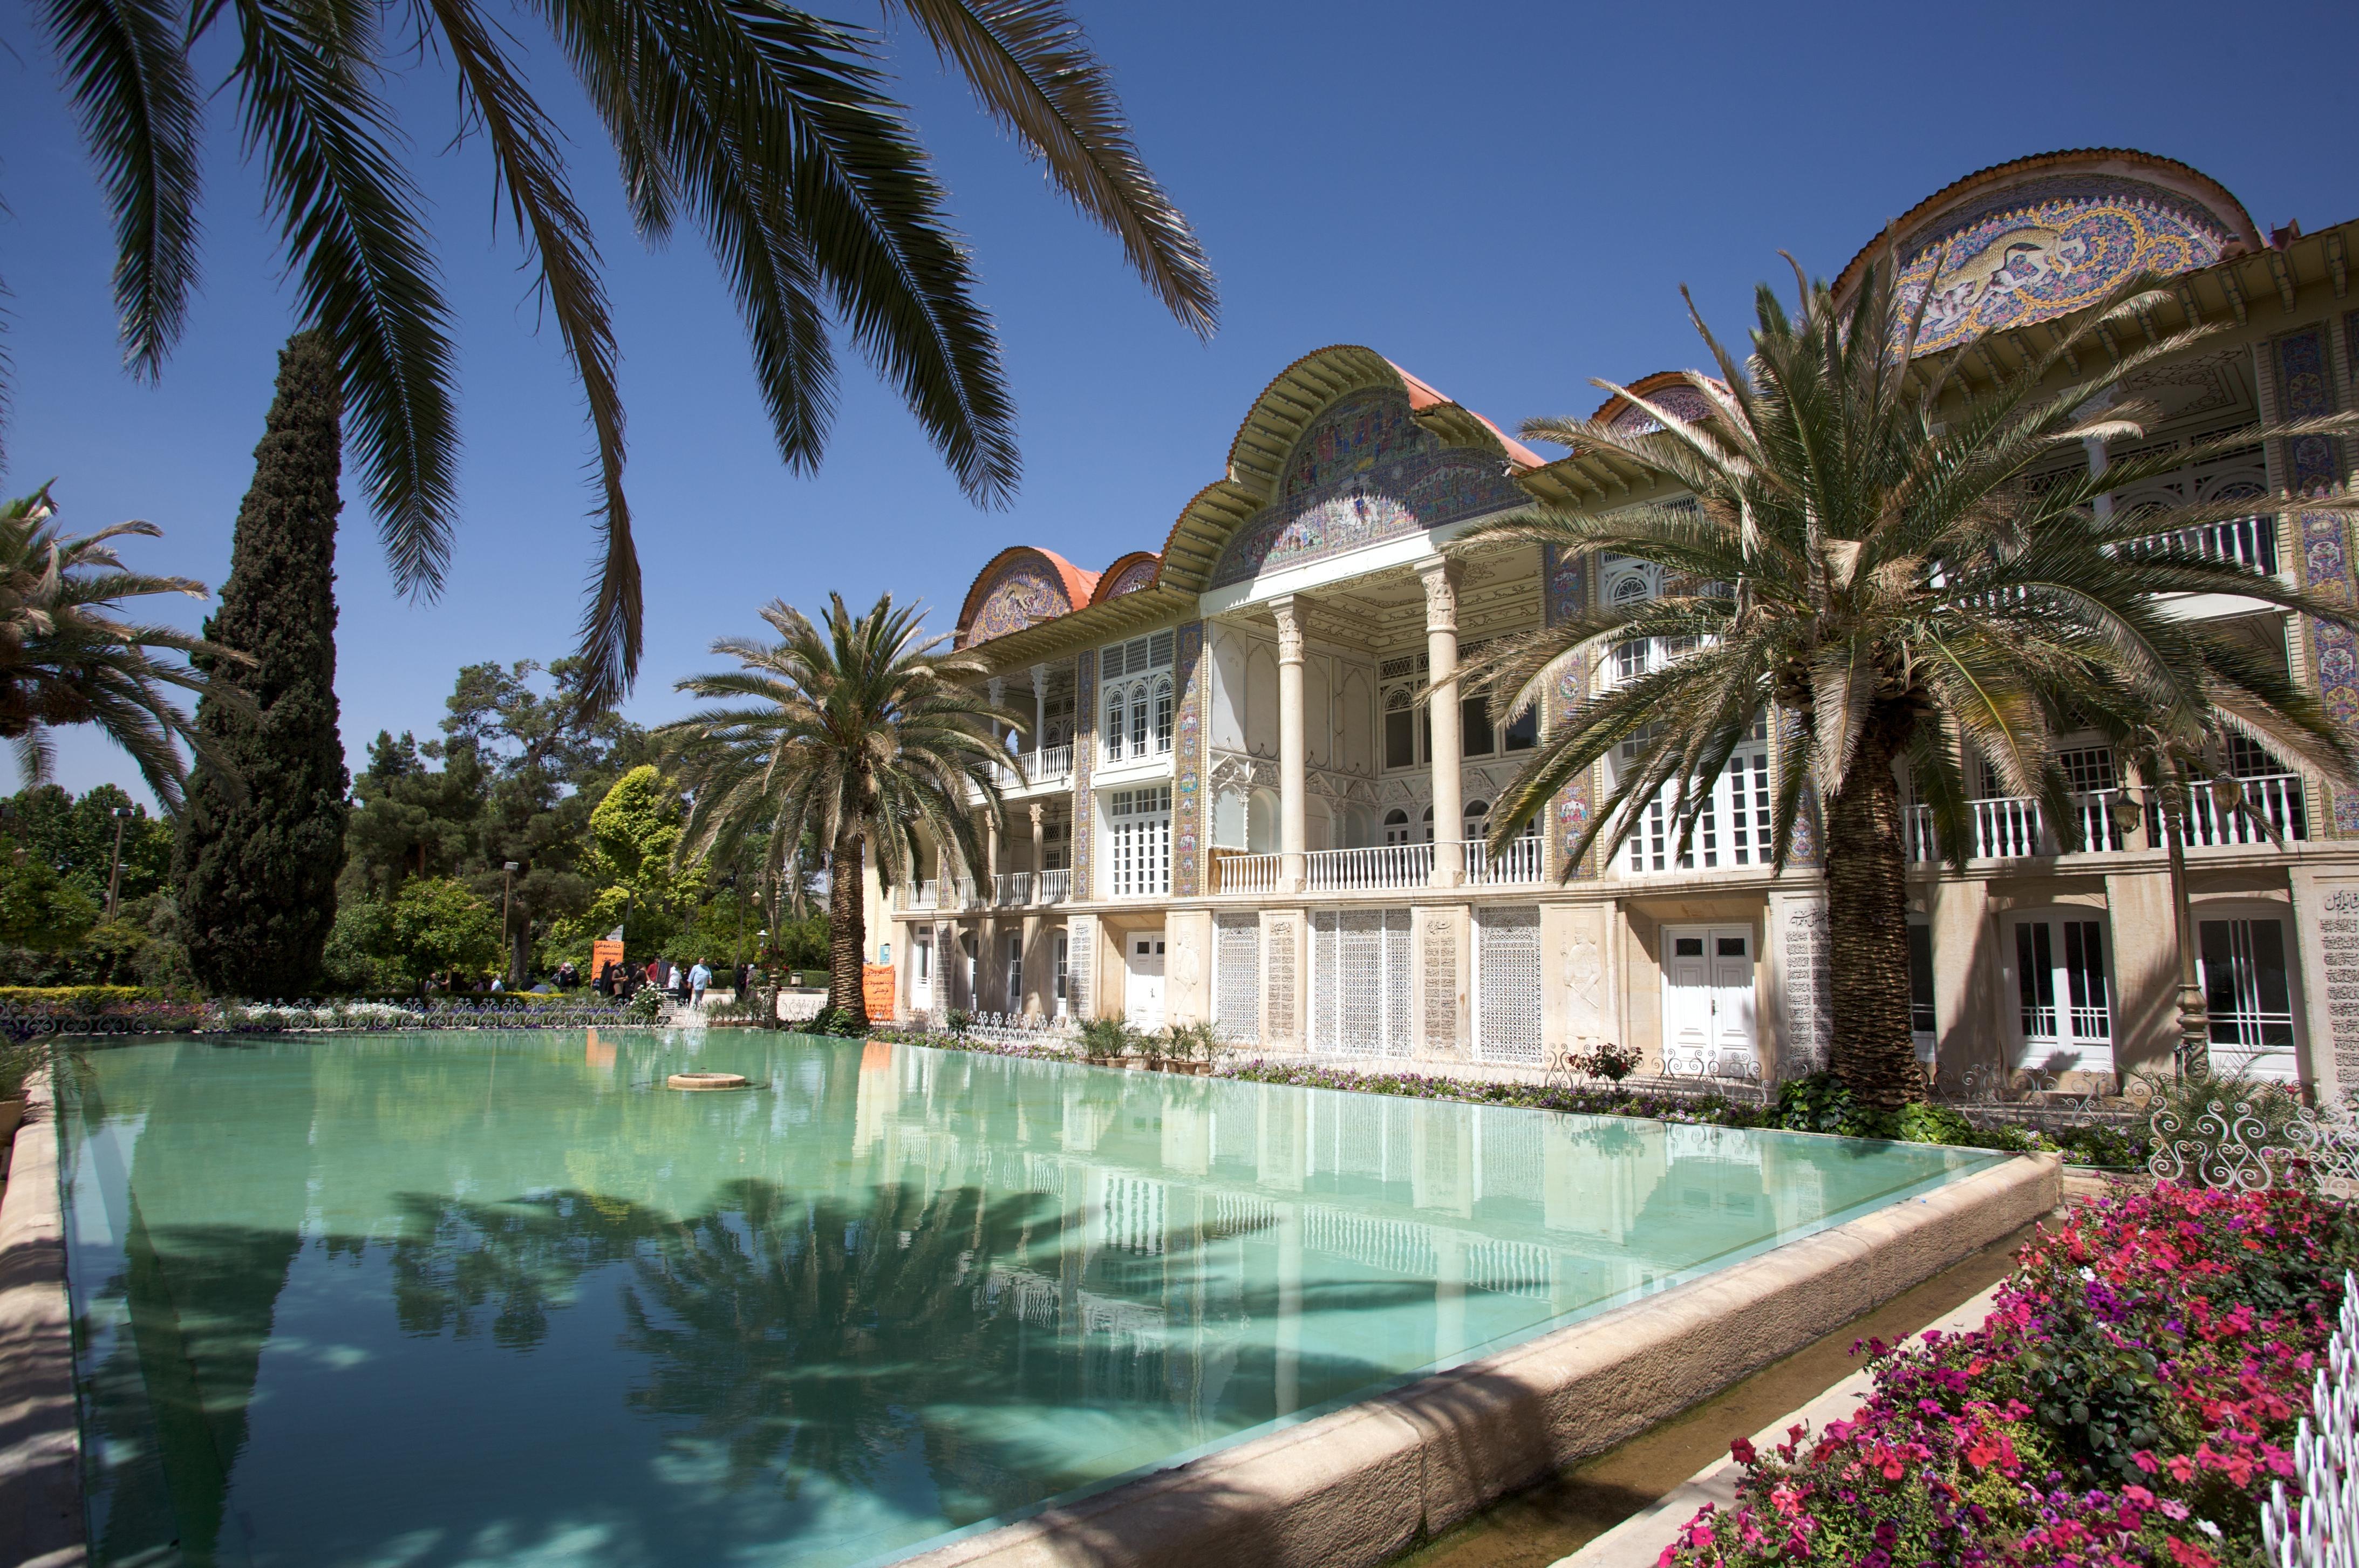 Hotel Garden Of Eden Bulgarien Bewertung